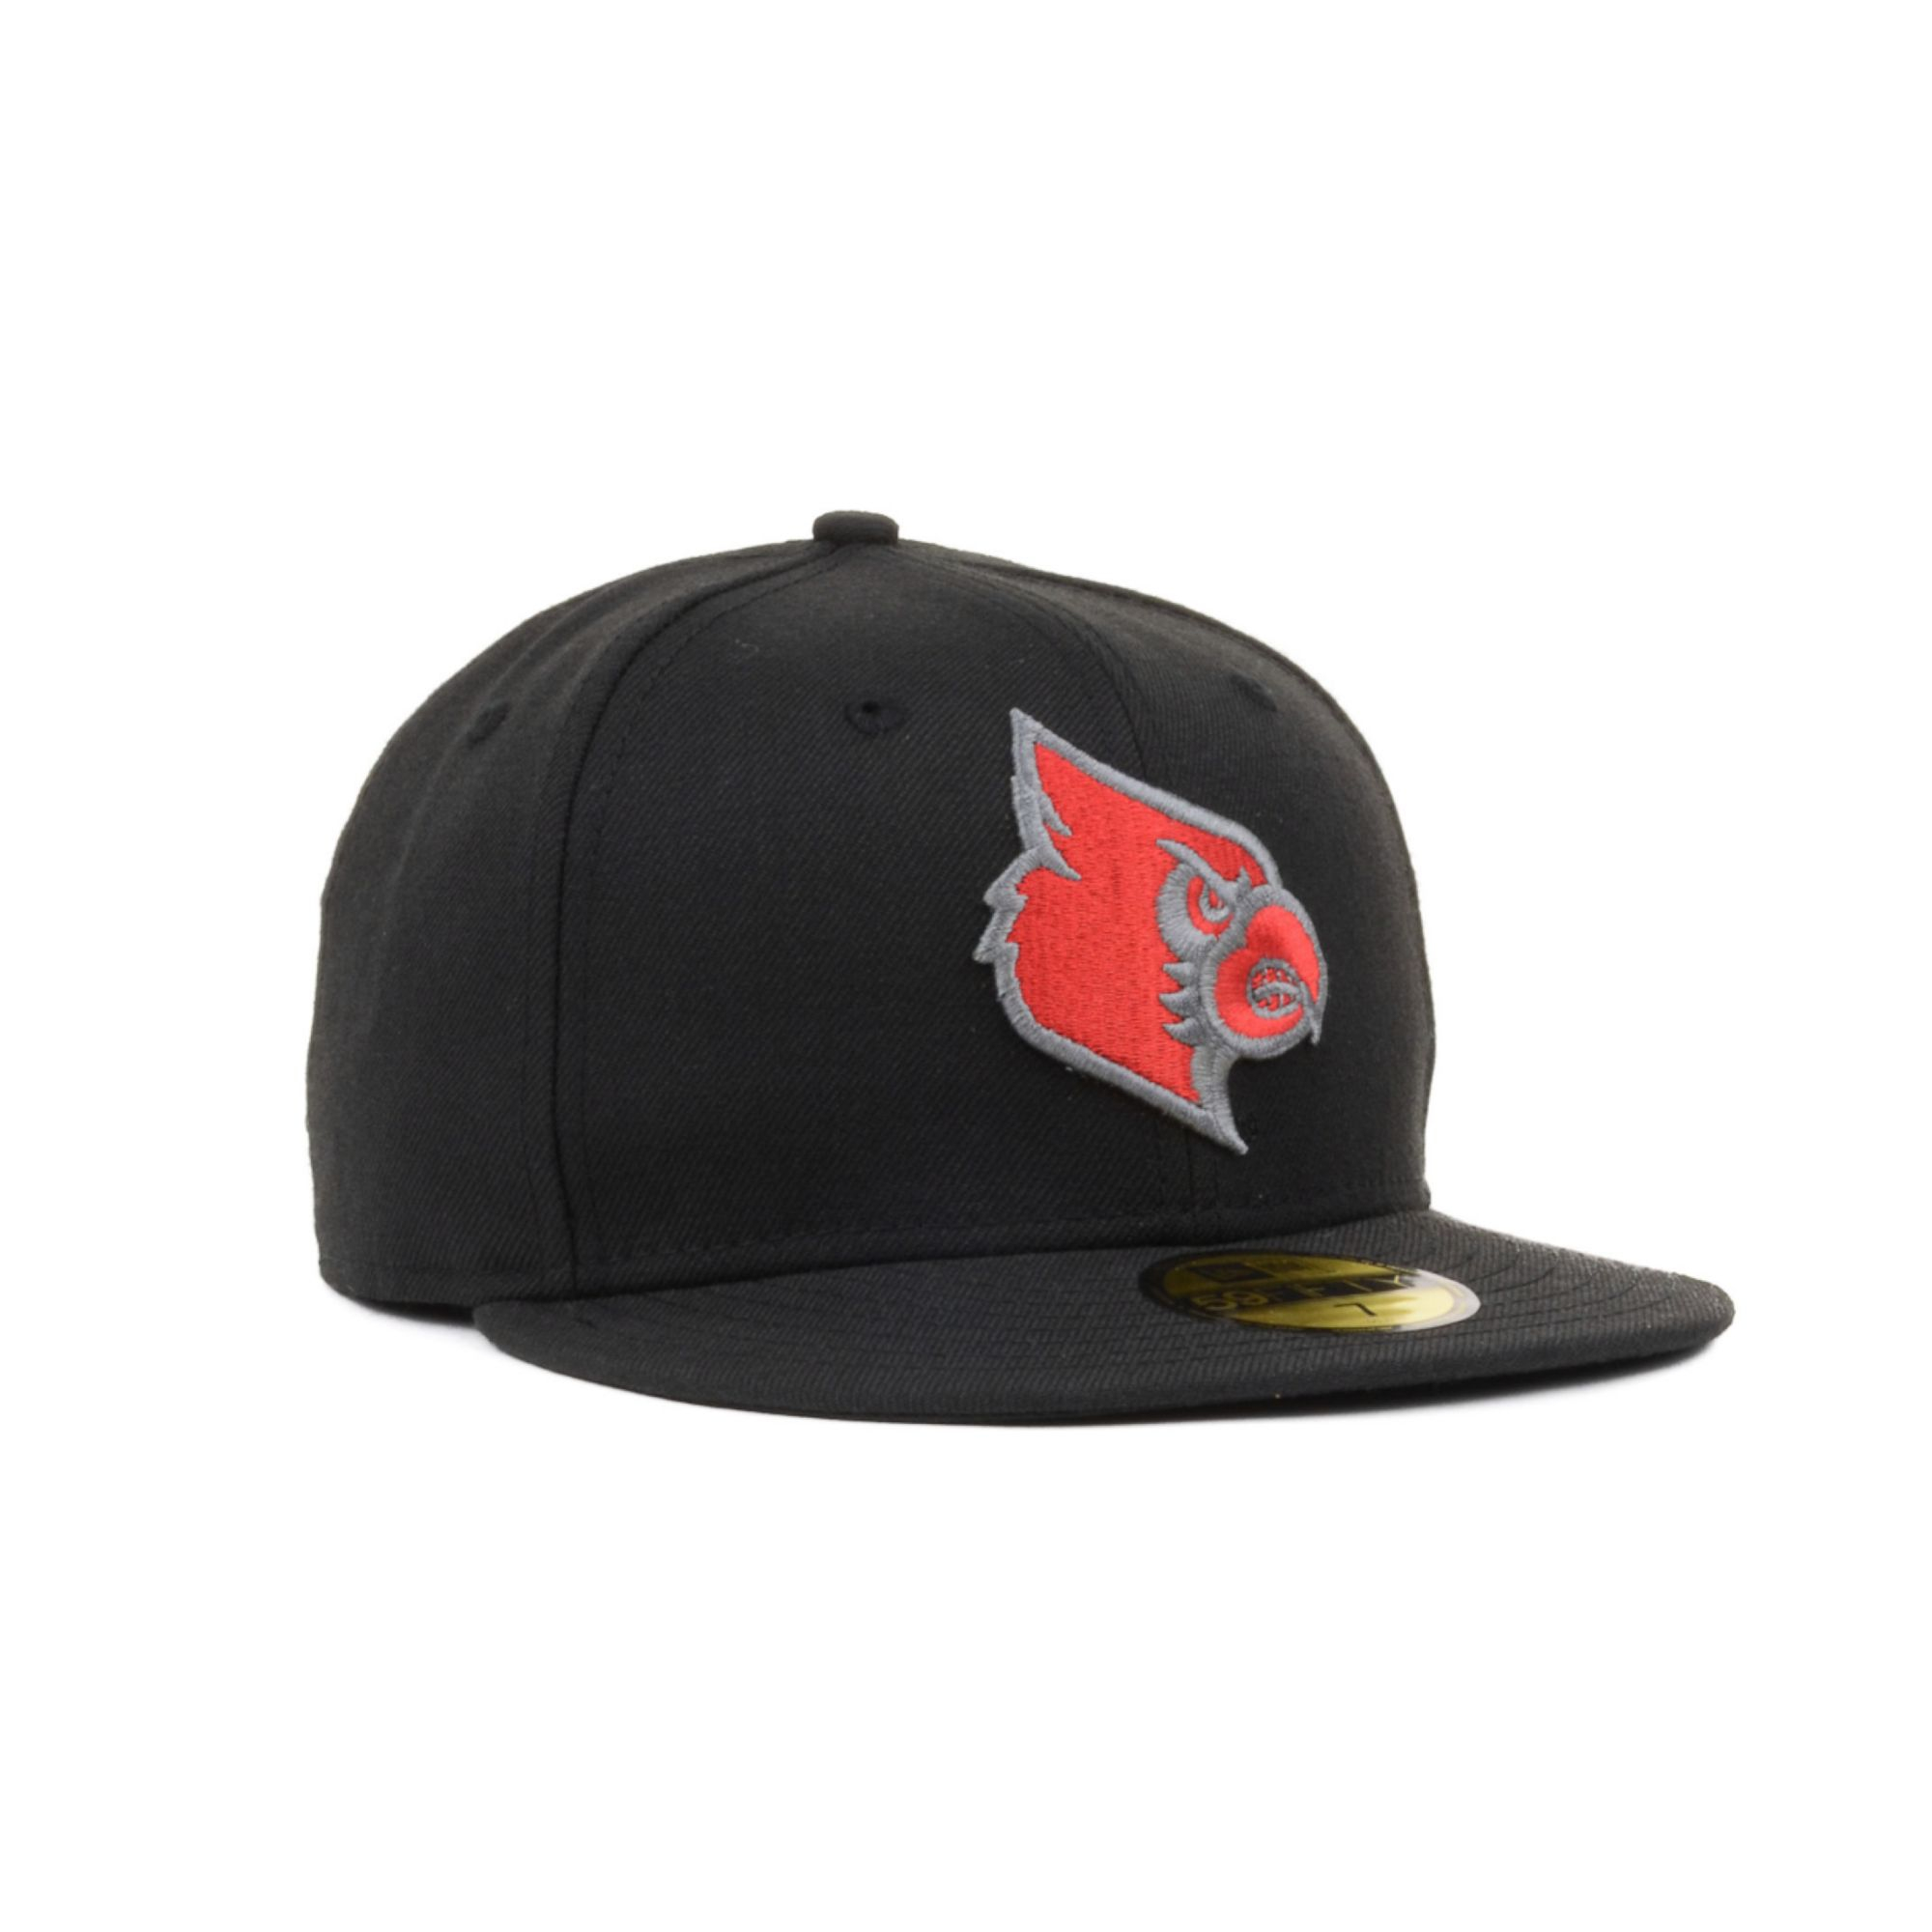 quality design af235 4a2bc KTZ Louisville Cardinals Bgp 59fifty Cap in Black for Men - Lyst